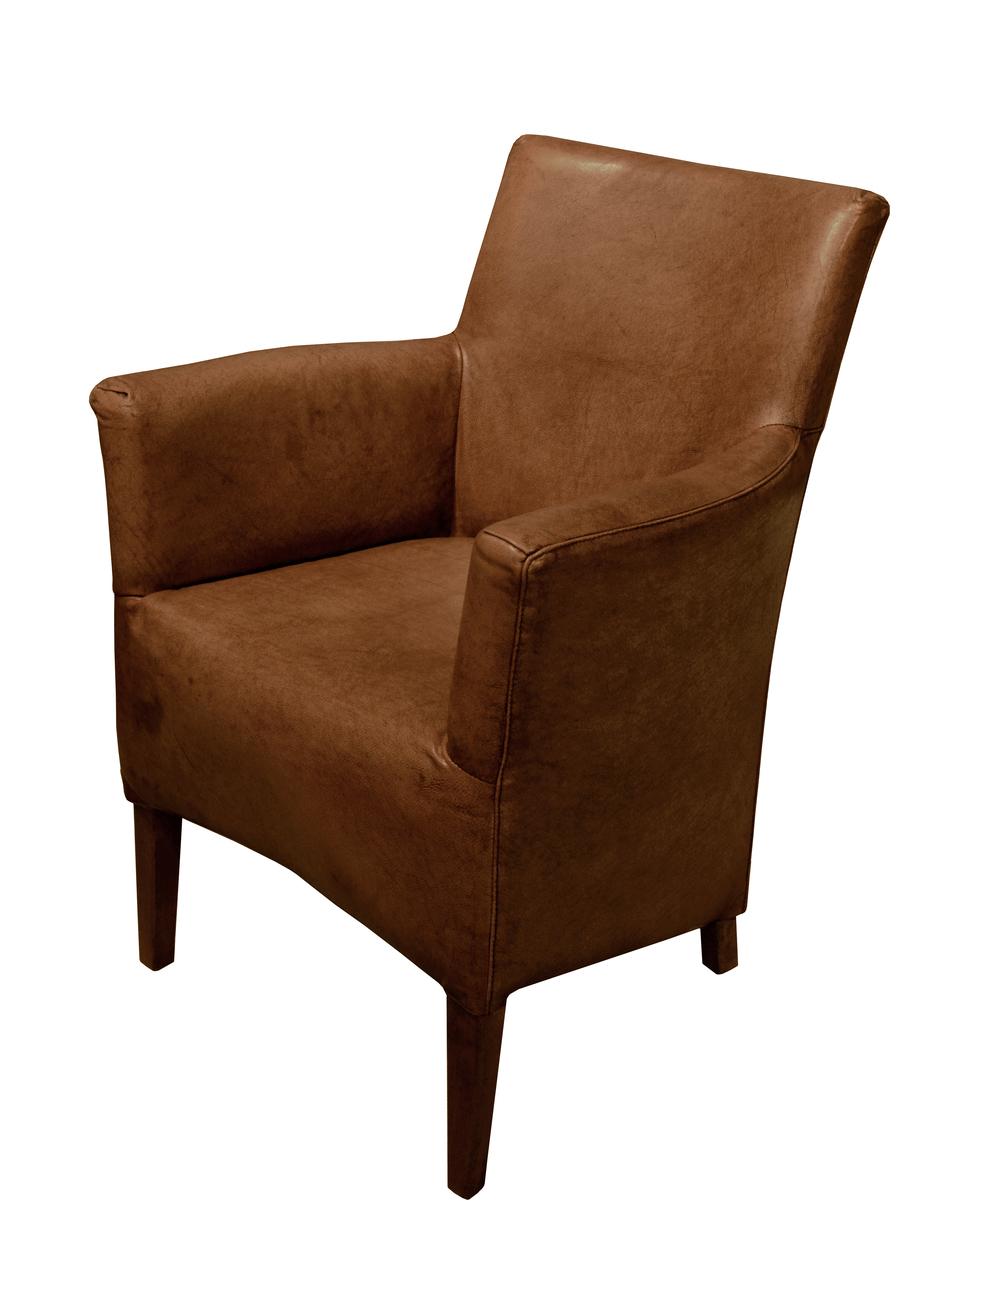 GJ Styles - Nils Arm Chair, Light Brown Buffalo